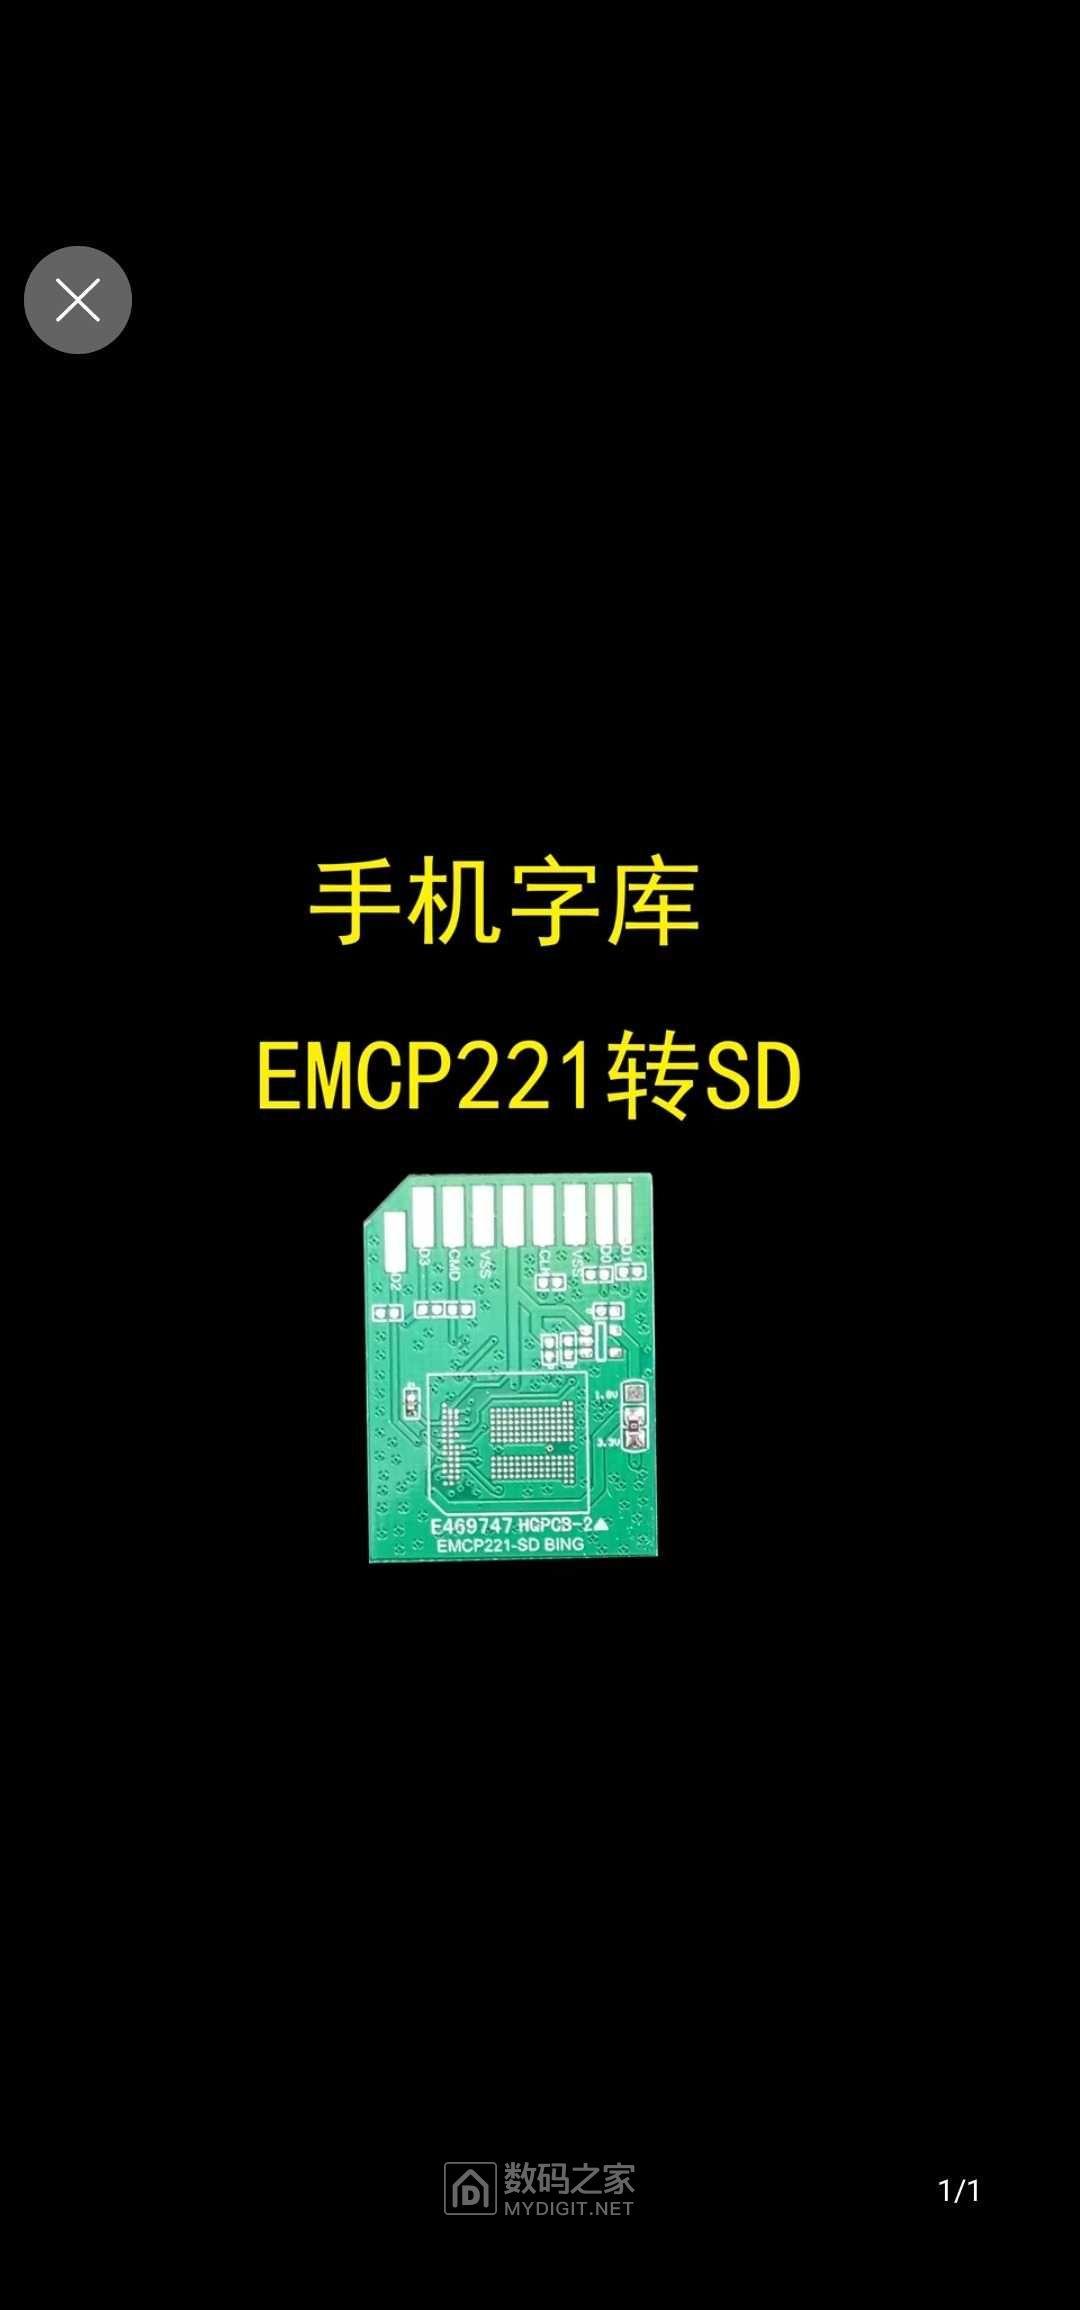 Screenshot_20190825_093133_com.taobao.taobao.jpg